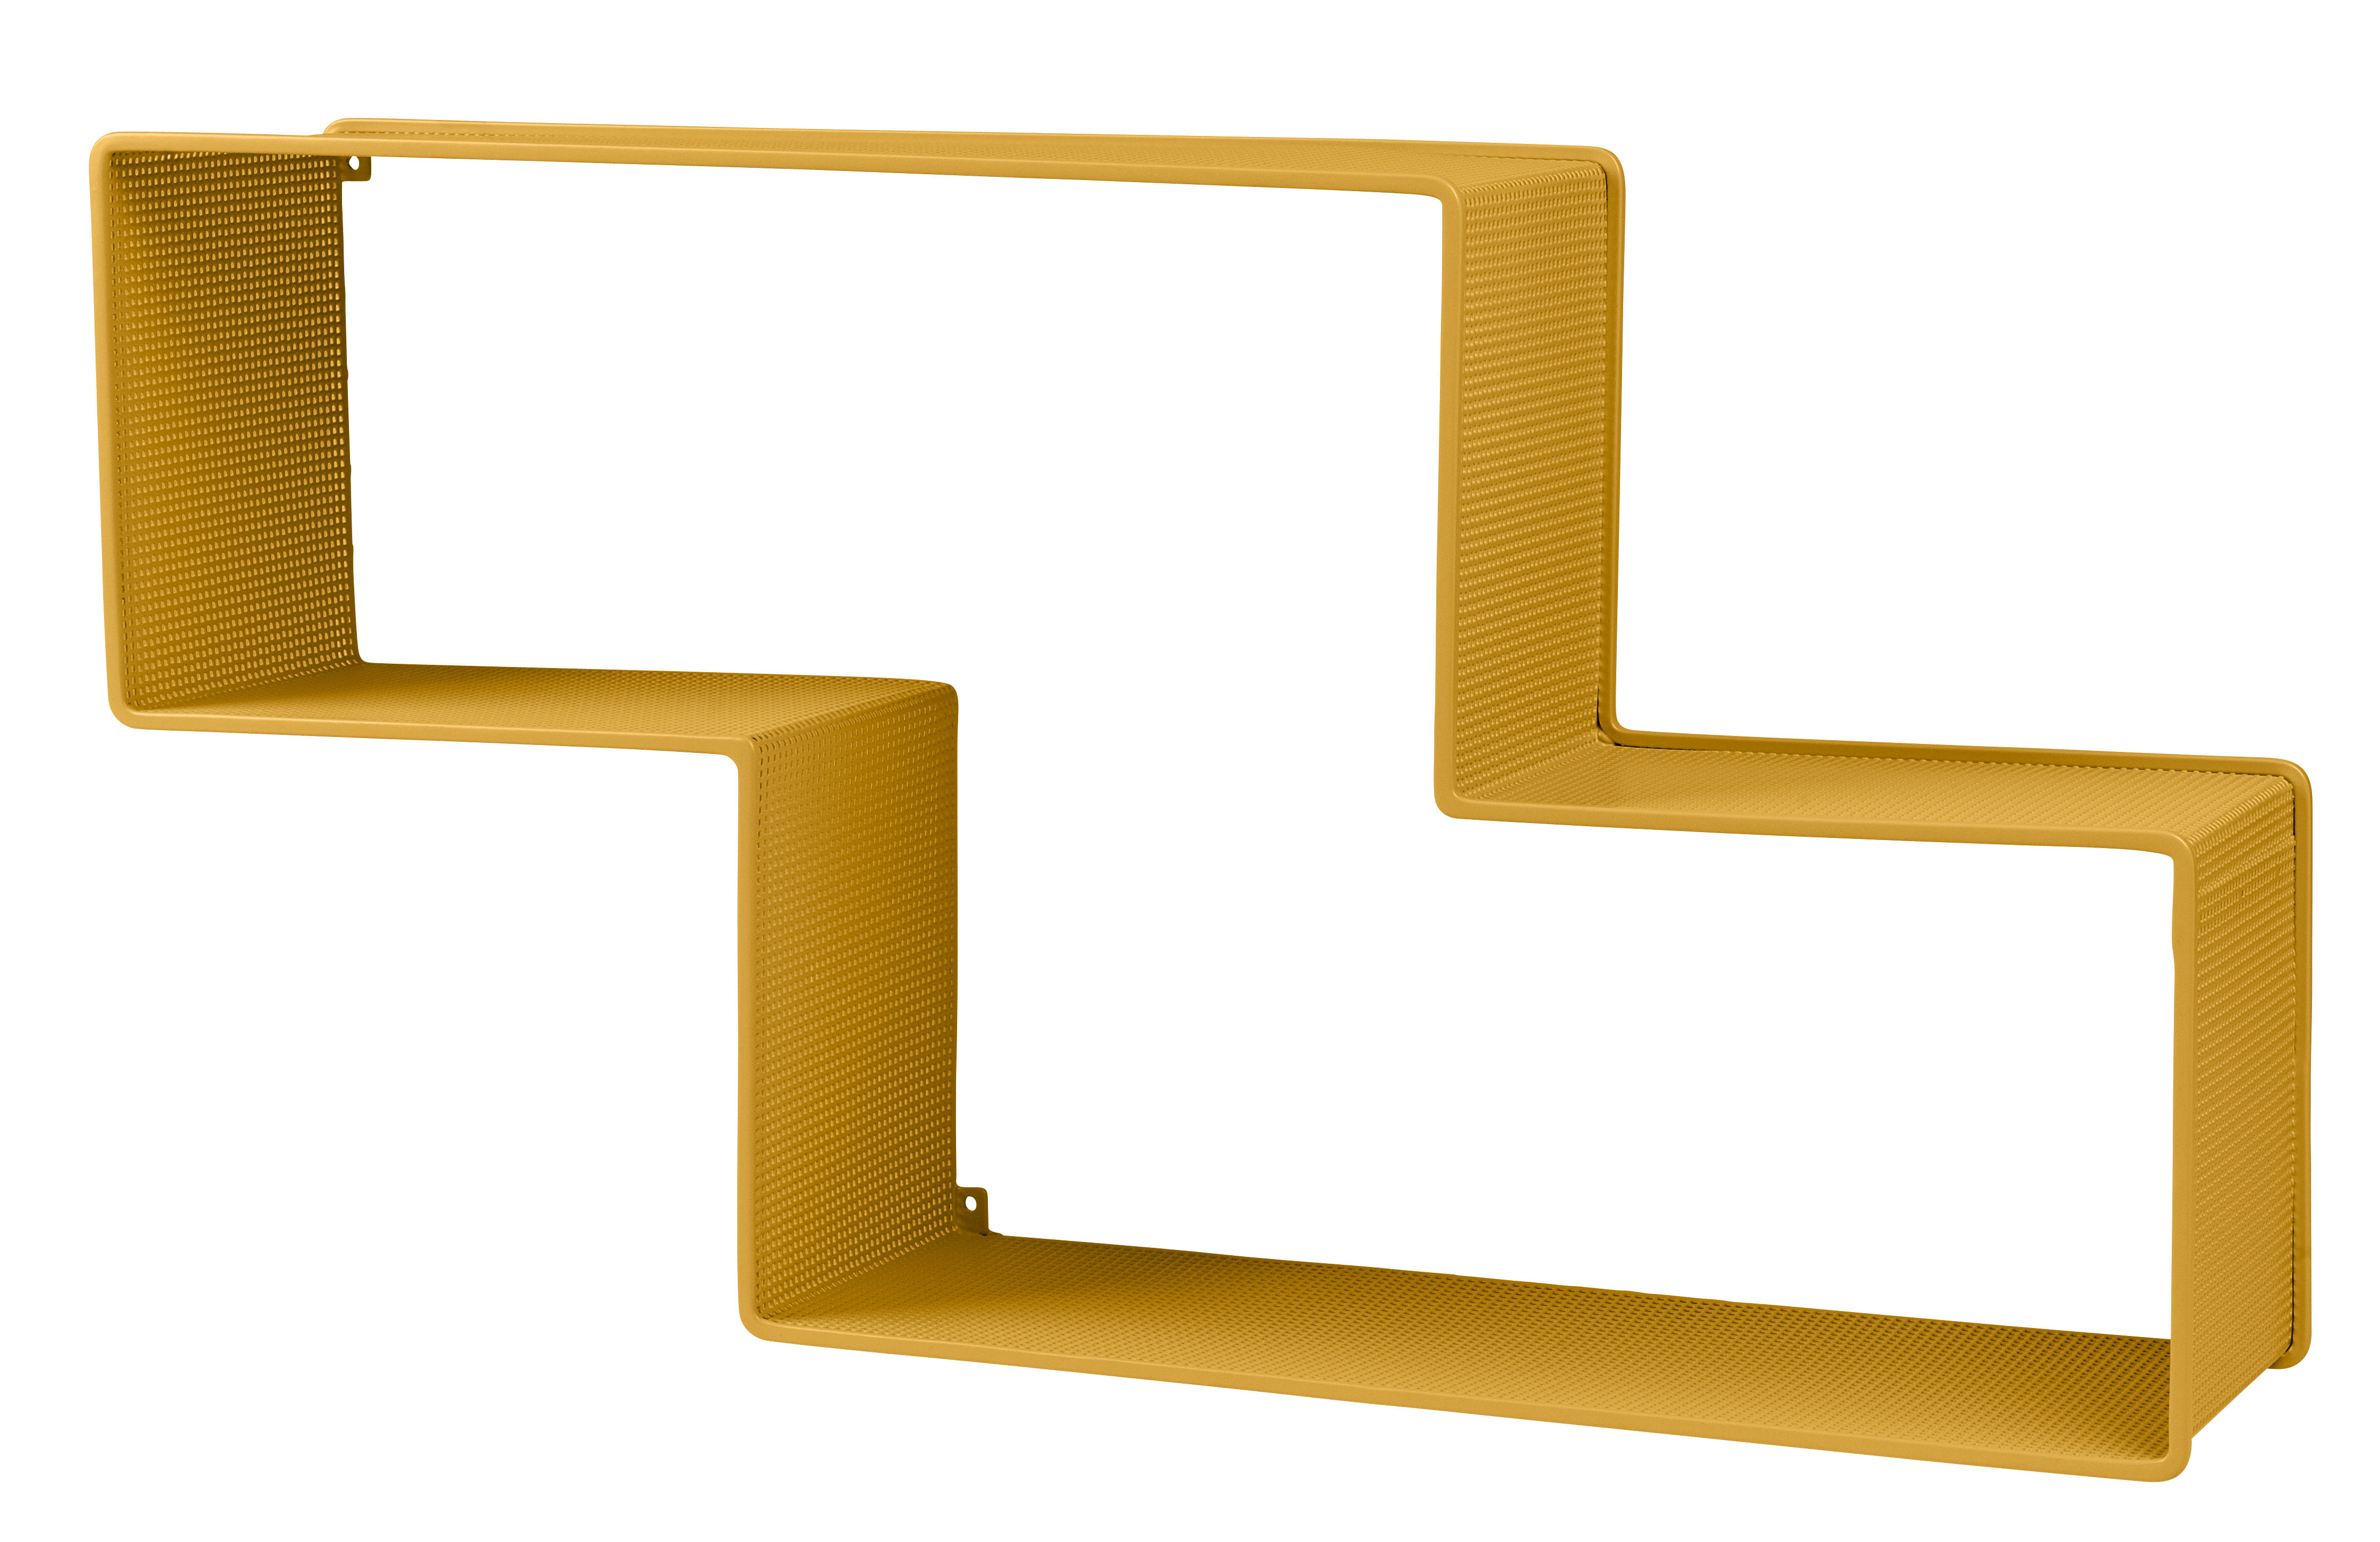 Furniture - Bookcases & Bookshelves - Dédal Shelf - W 90 x H 49 cm - 1950 by Gubi - Venetian Gold - Steel plate